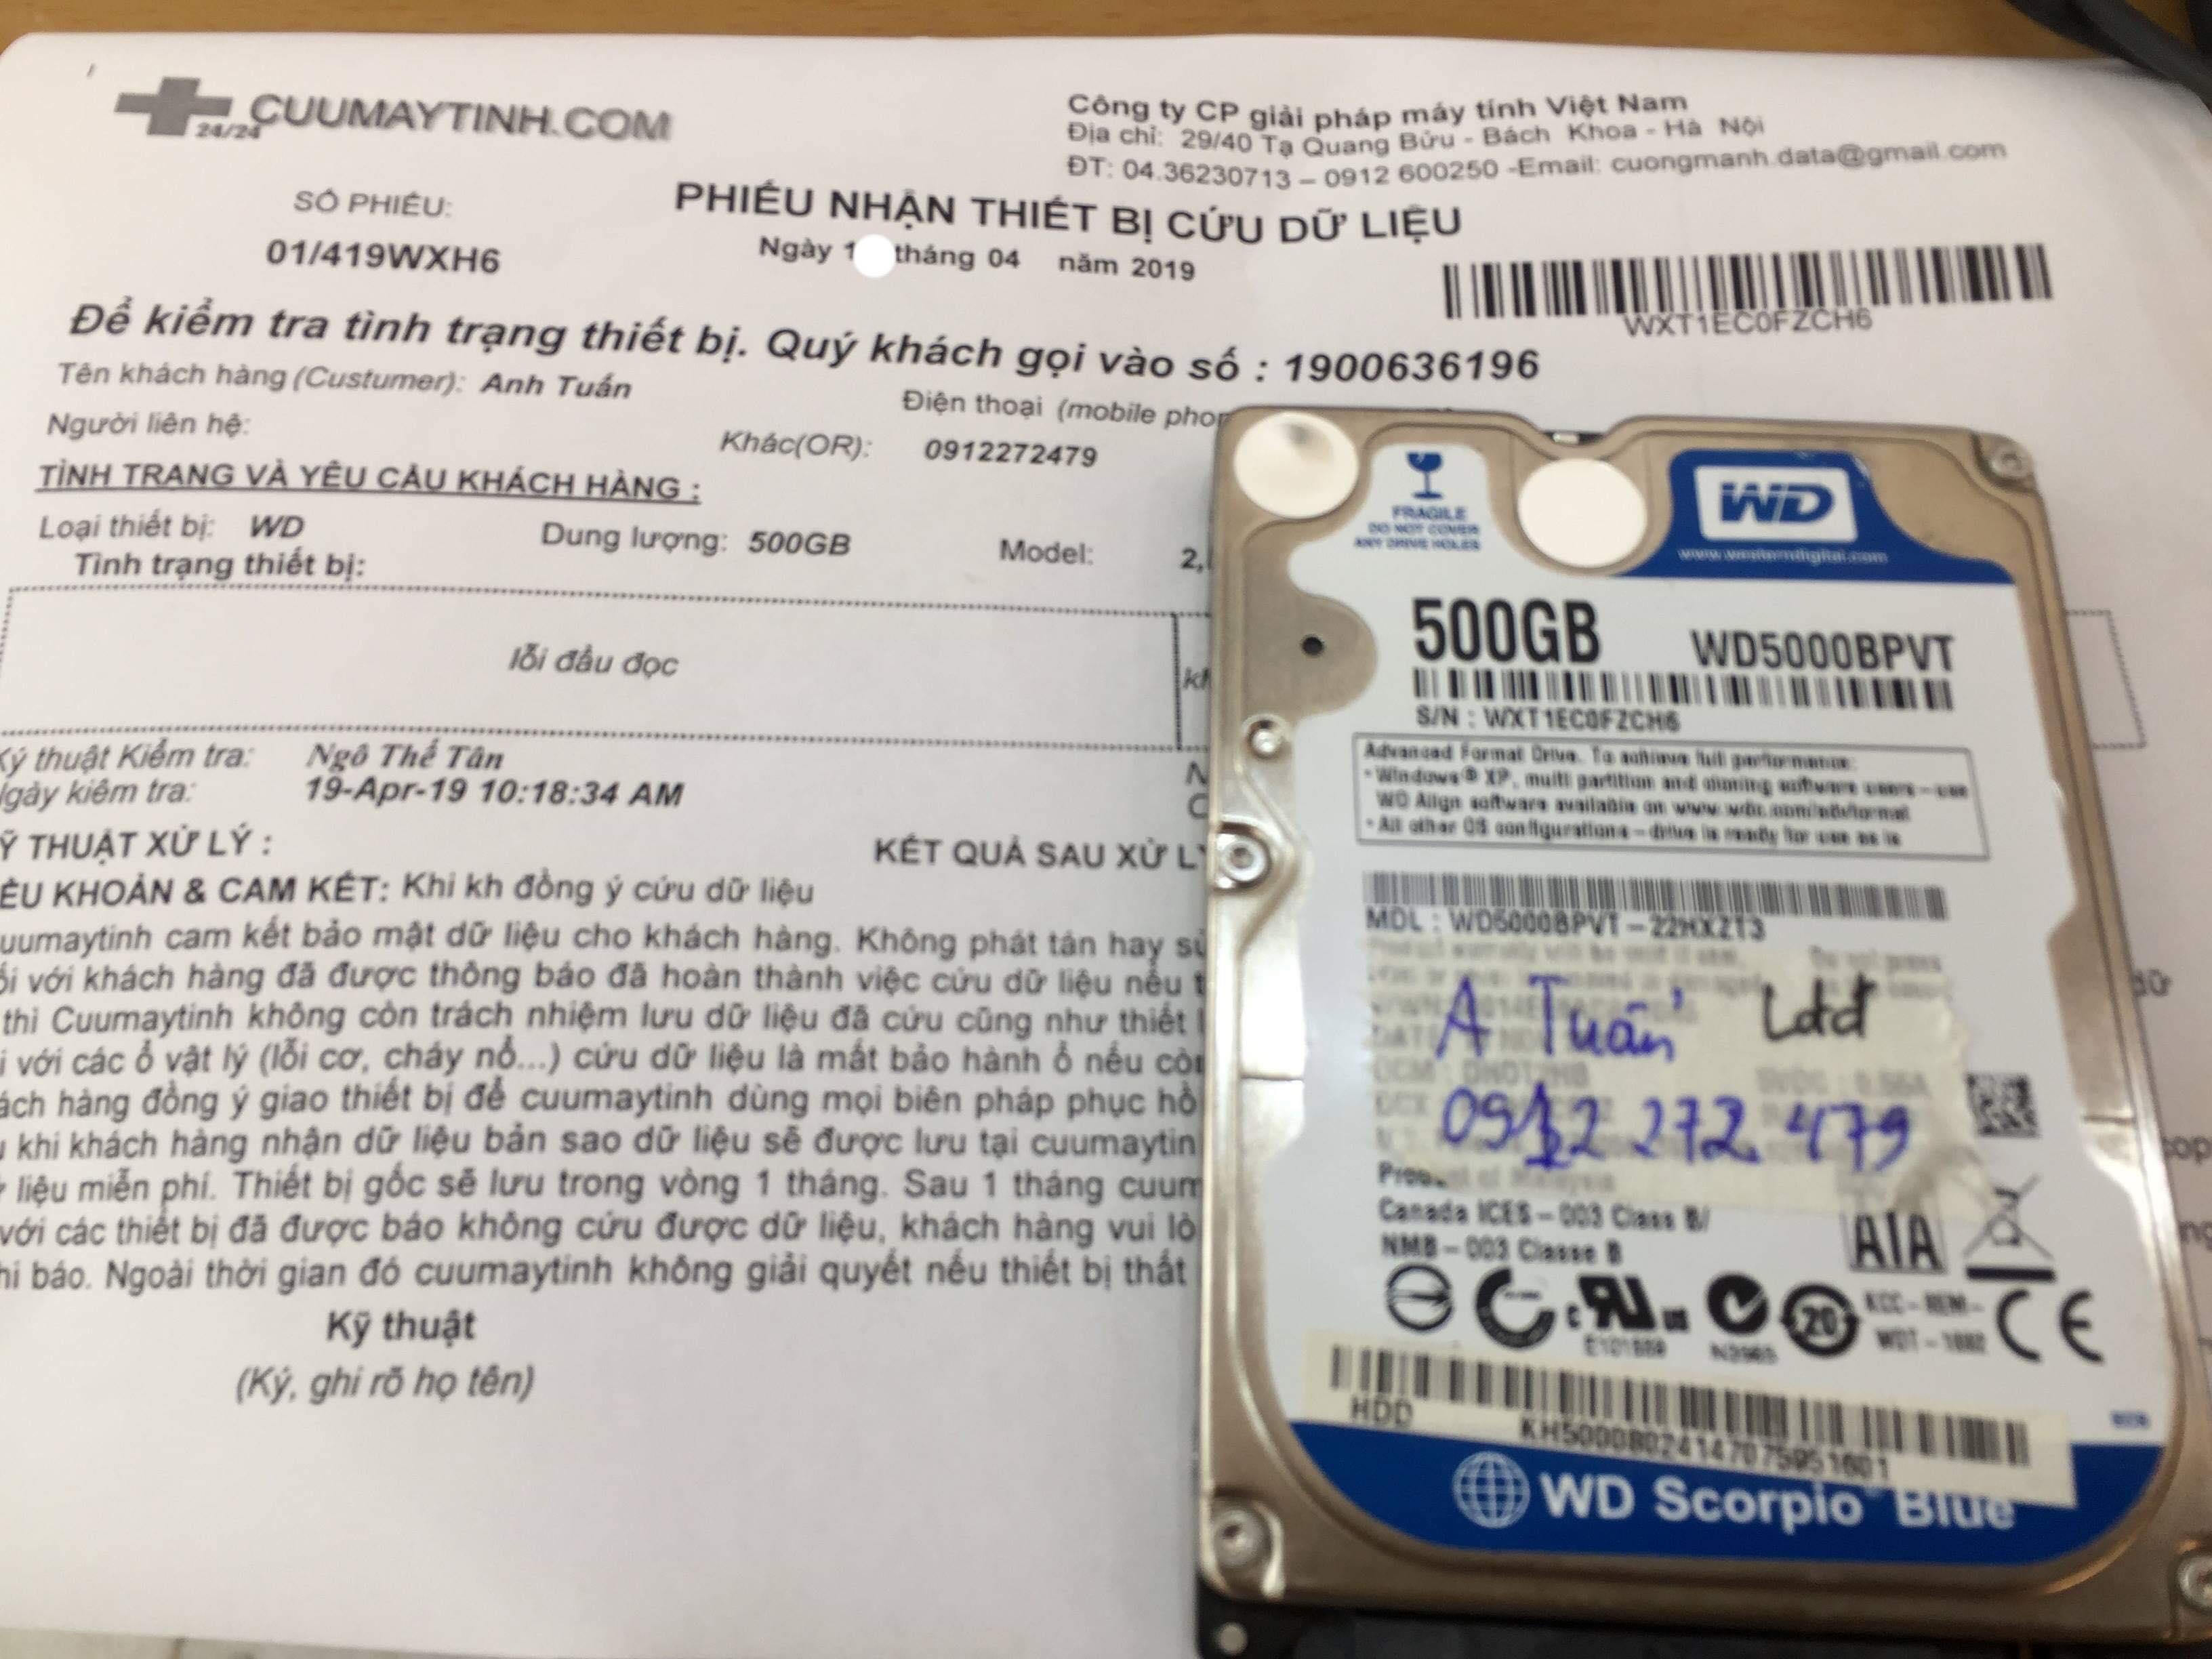 Lấy dữ liệu ổ cứng Western 500GB lỗi đầu đọc 22/04/2019 - cuumaytinh